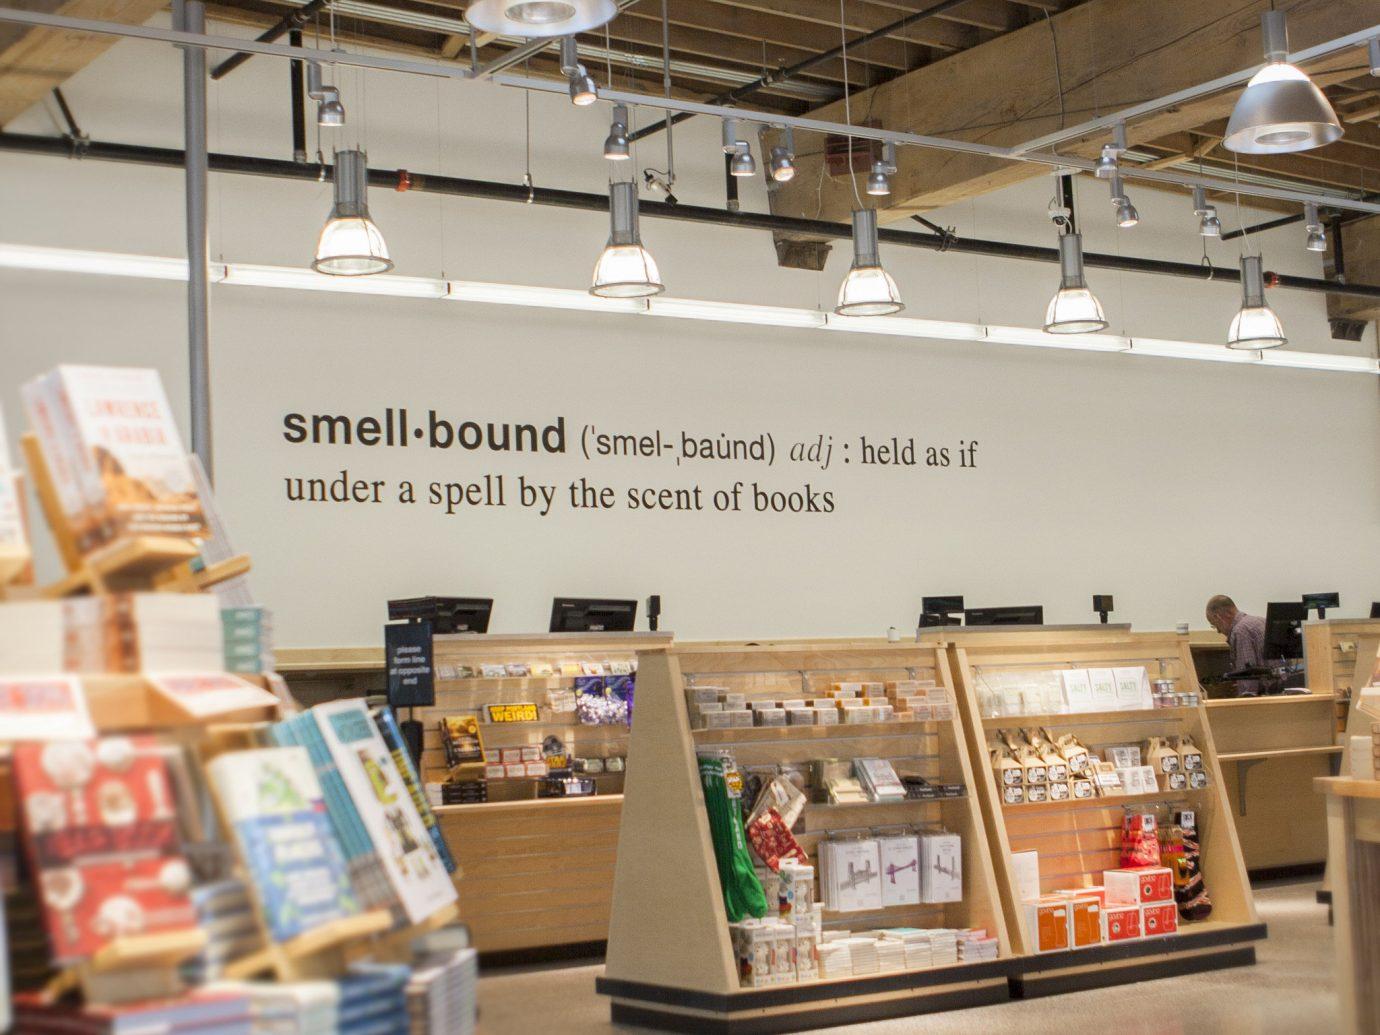 Offbeat indoor floor ceiling interior design Design retail tourist attraction library